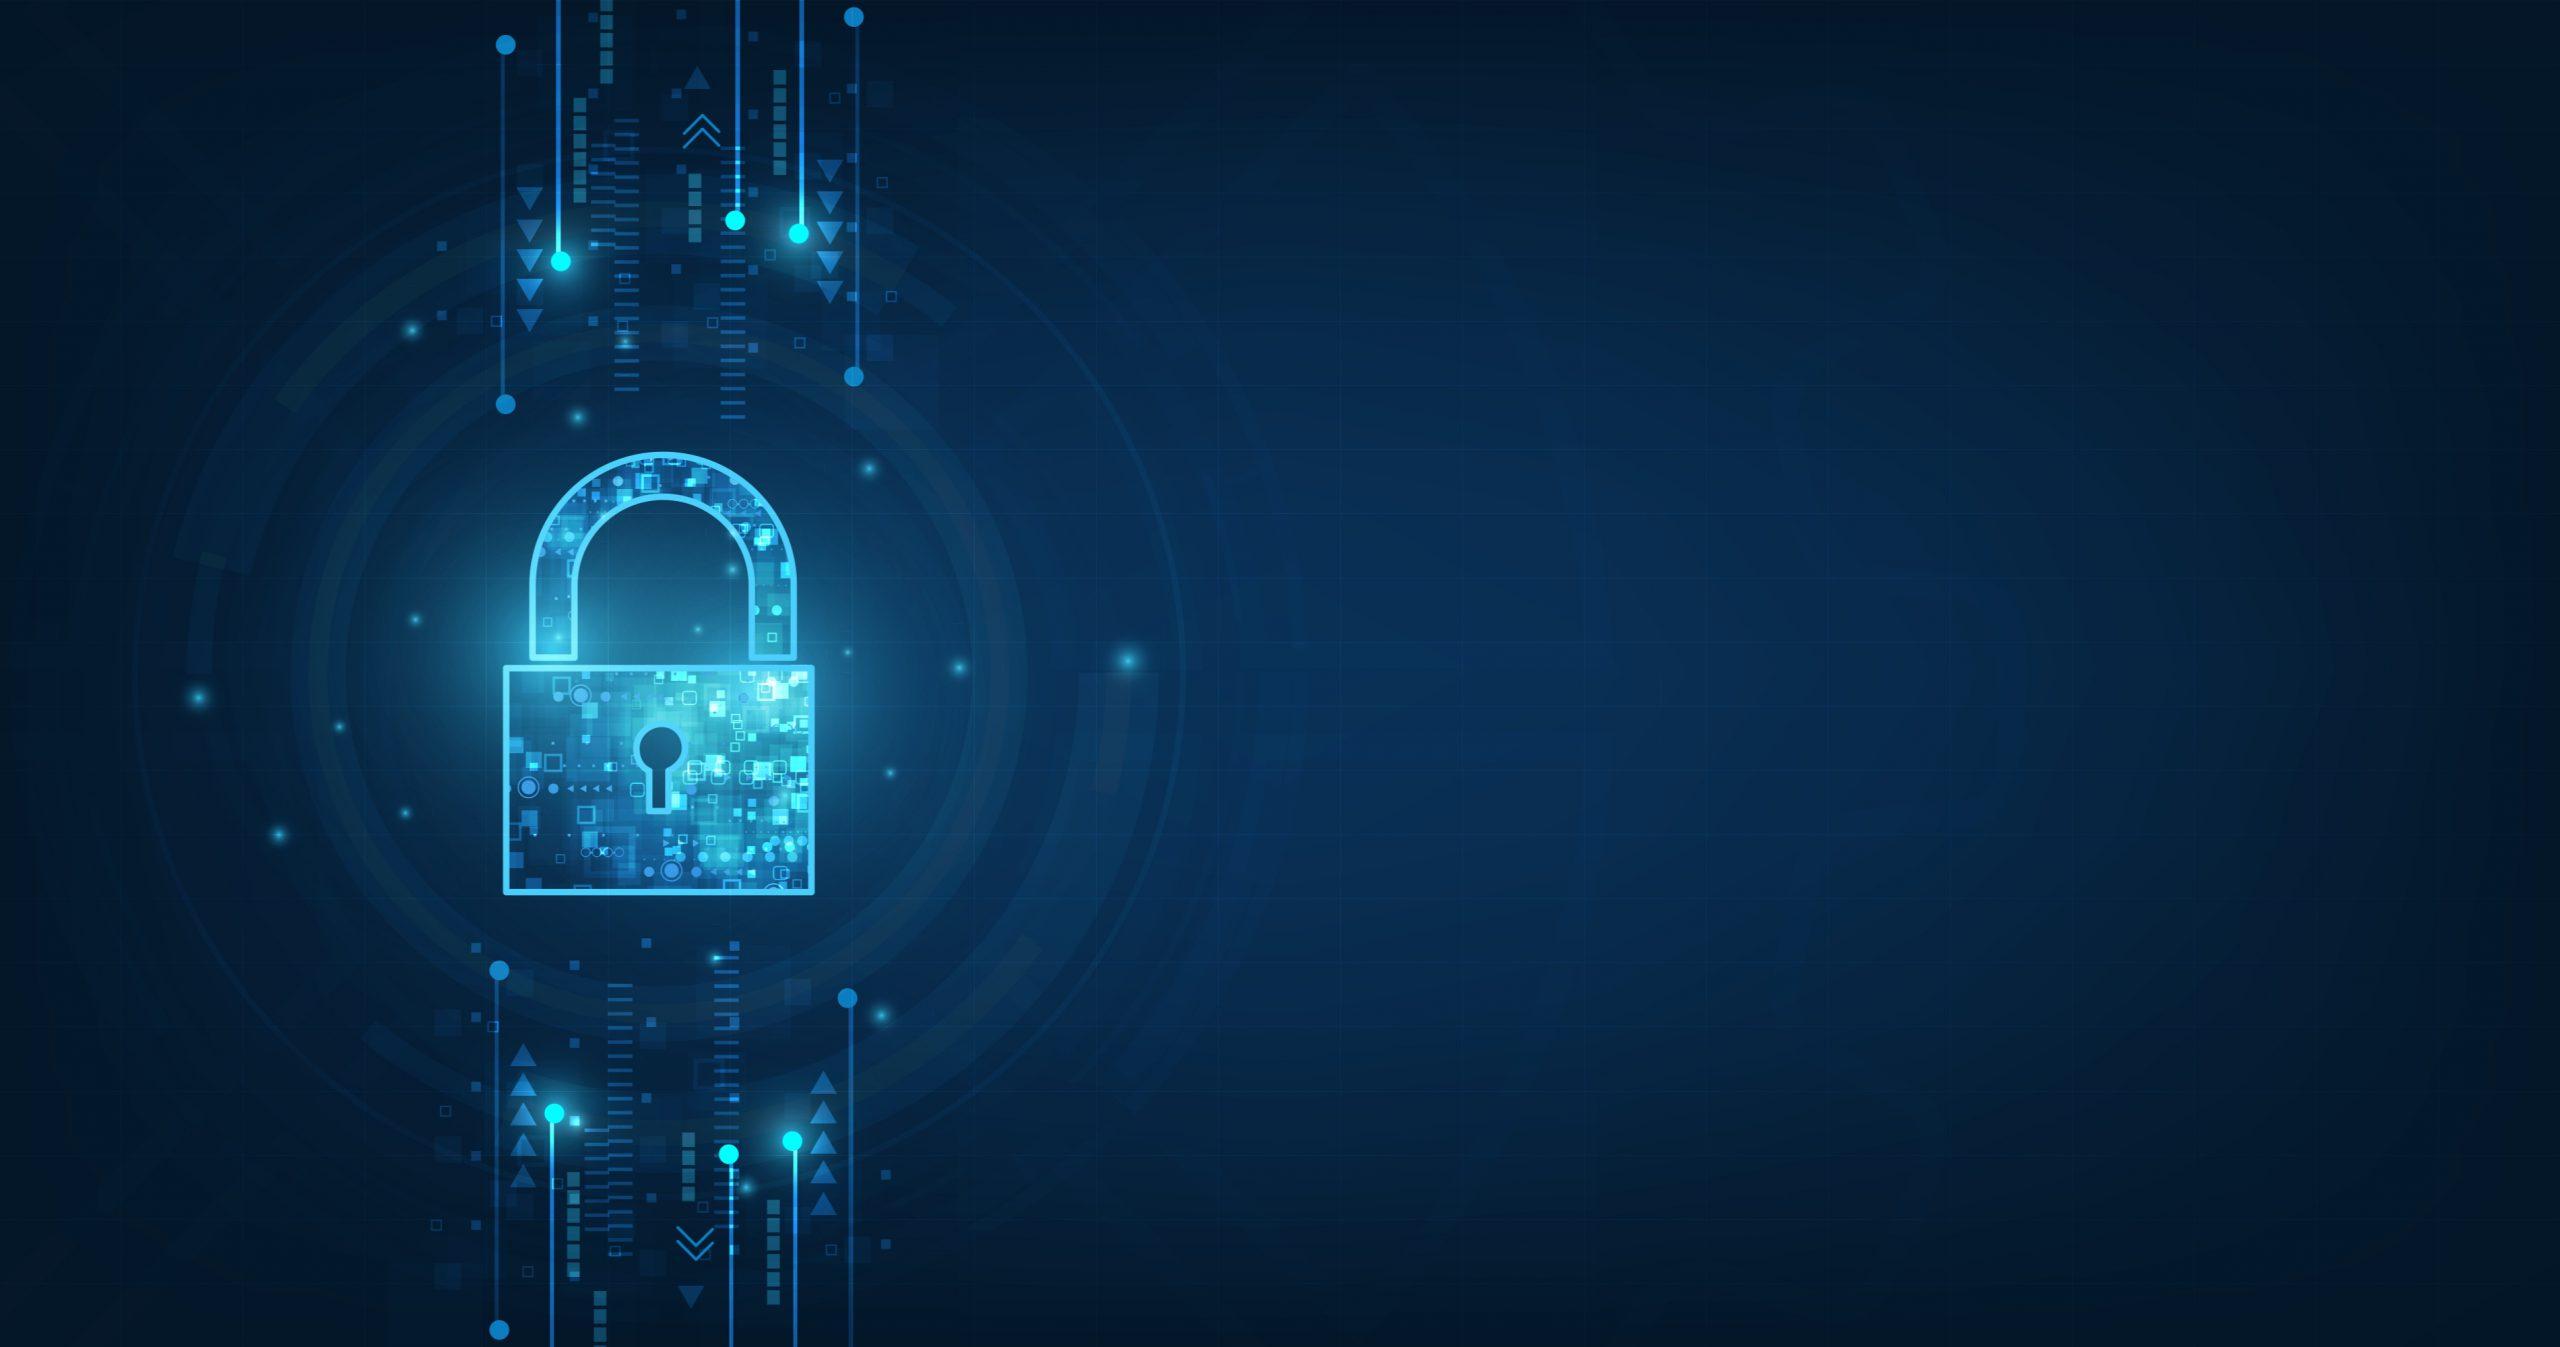 Cyber Security_Padlock